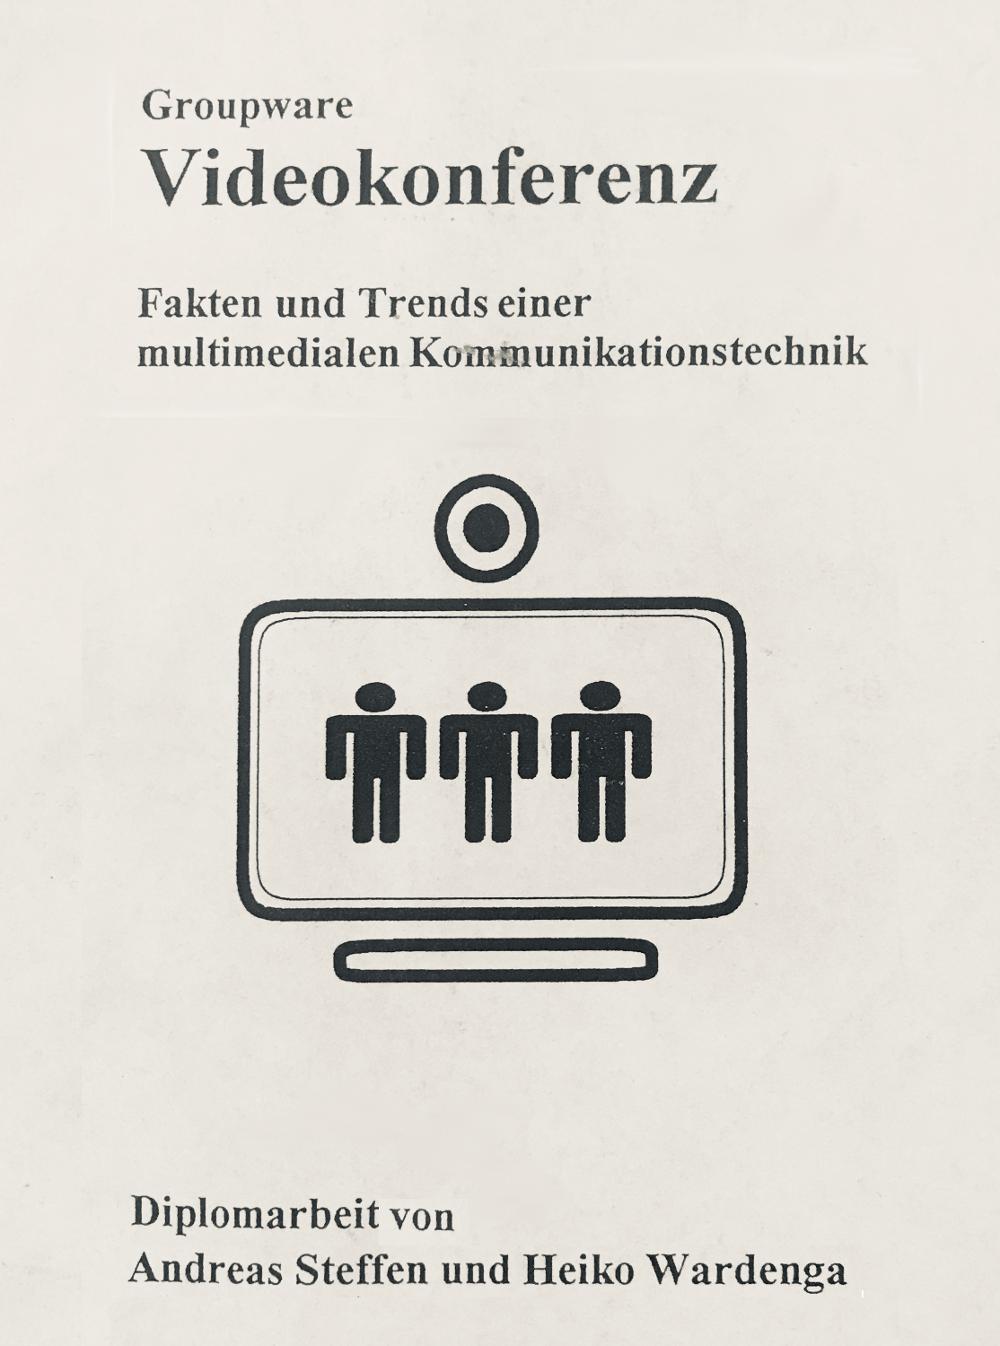 Groupware_Videokonferenz.jpg